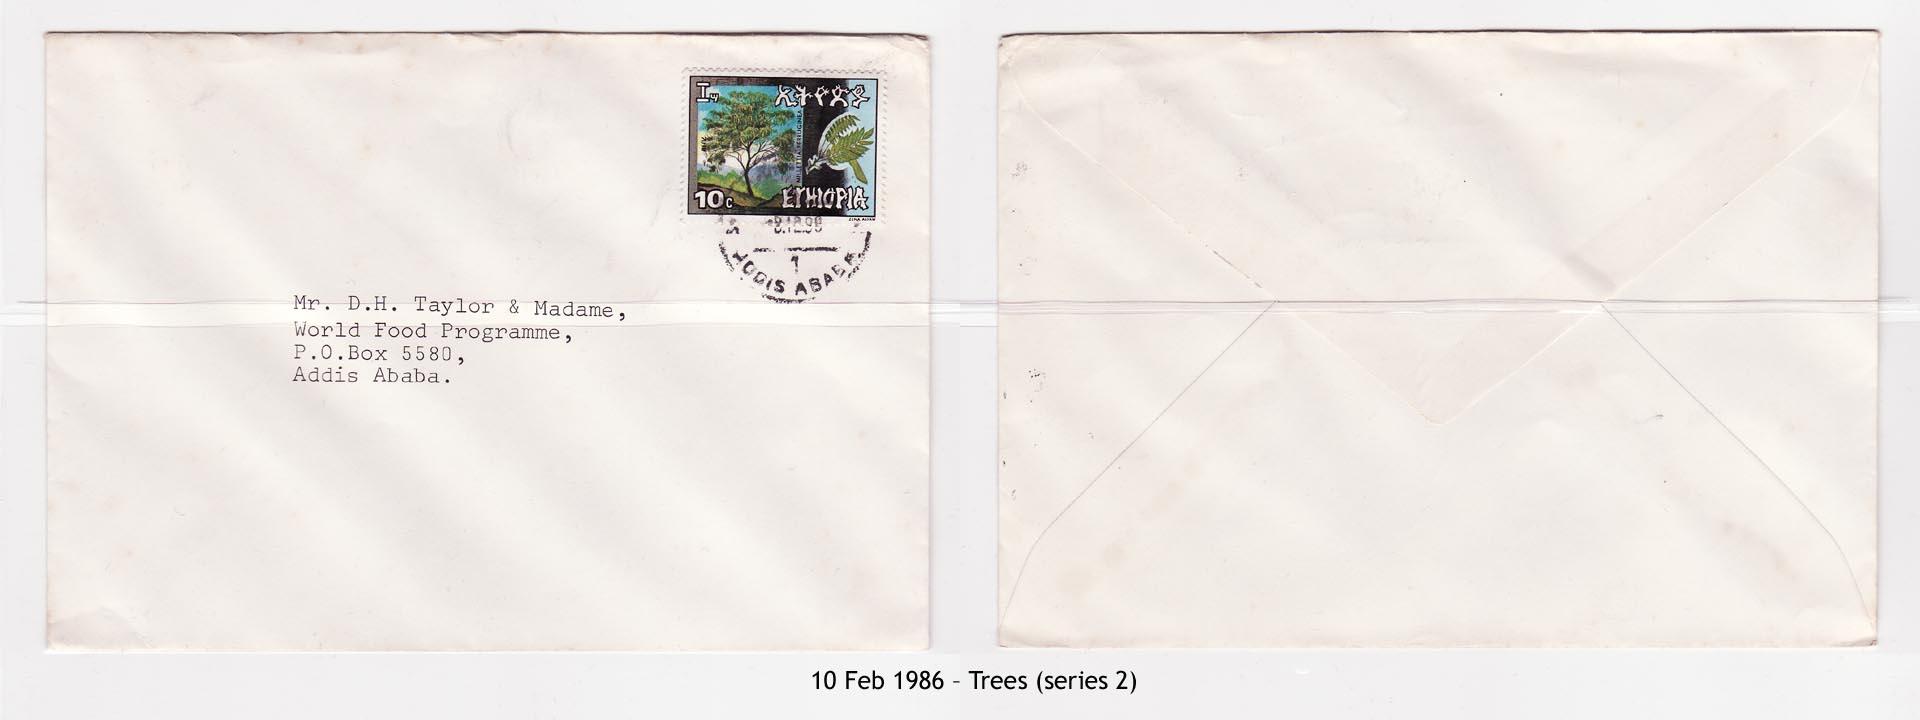 19860210 - Trees (series 2)